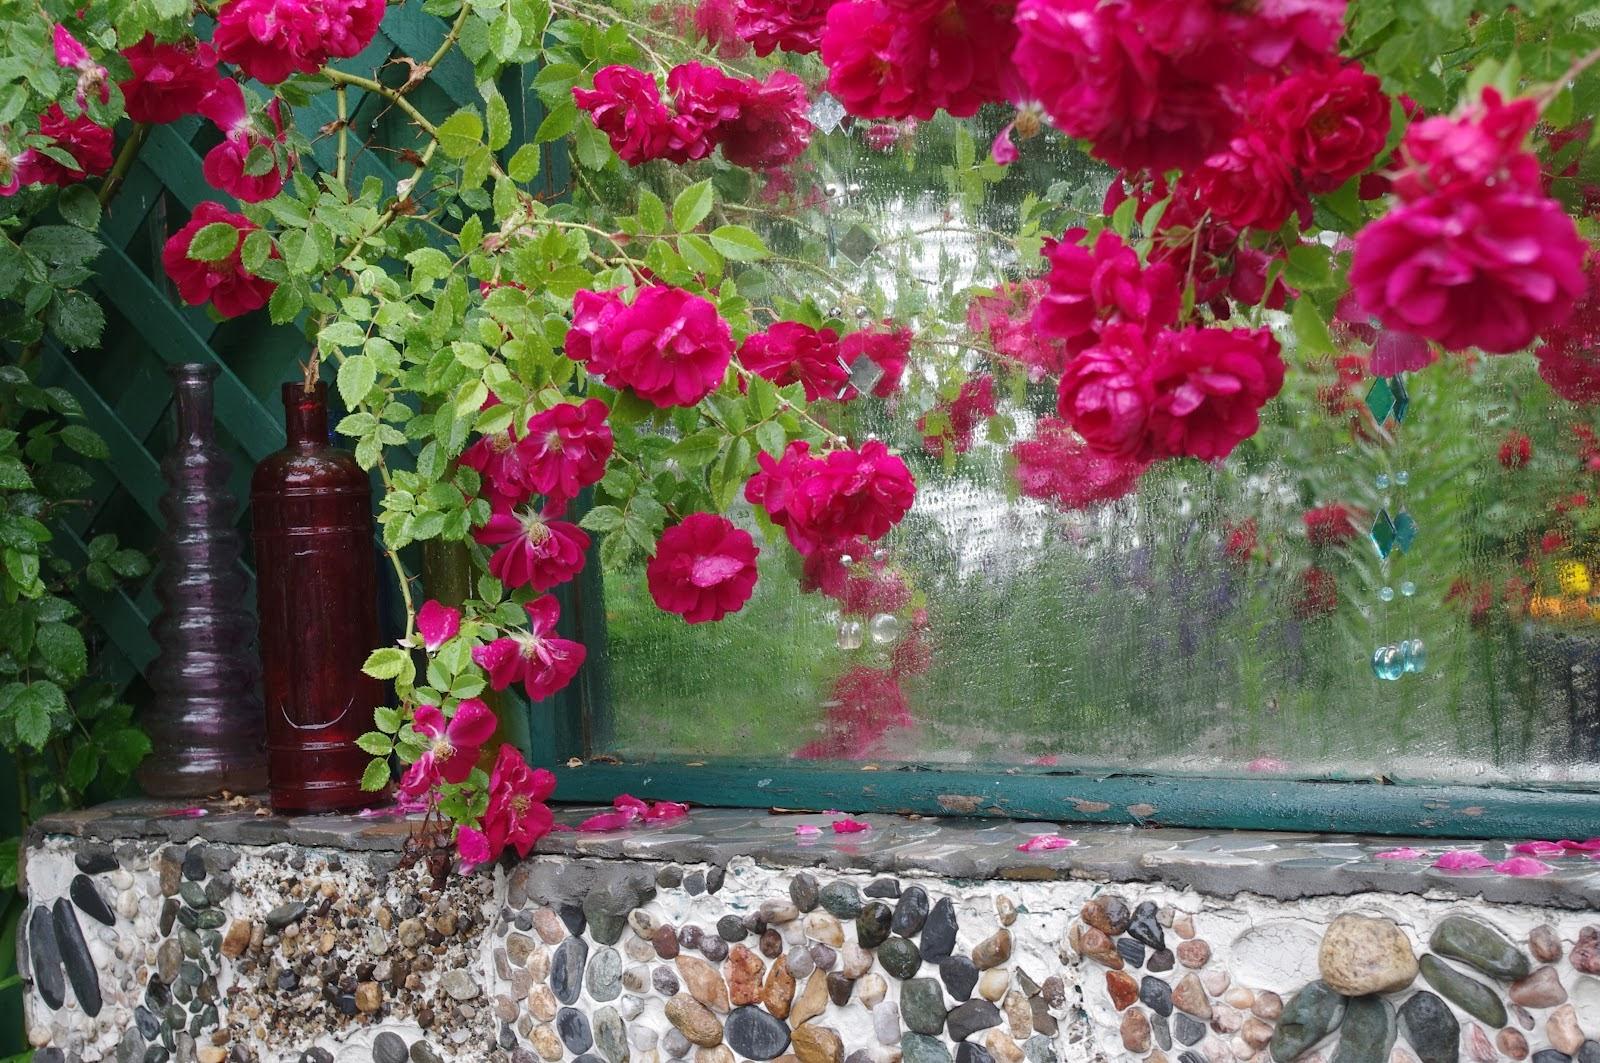 World4top rain on flower flower in rain wallpaper free download rain flower in rain wallpaper hd flower in rain wallpaper hq rain on flower wallpaper beautiful flower altavistaventures Image collections